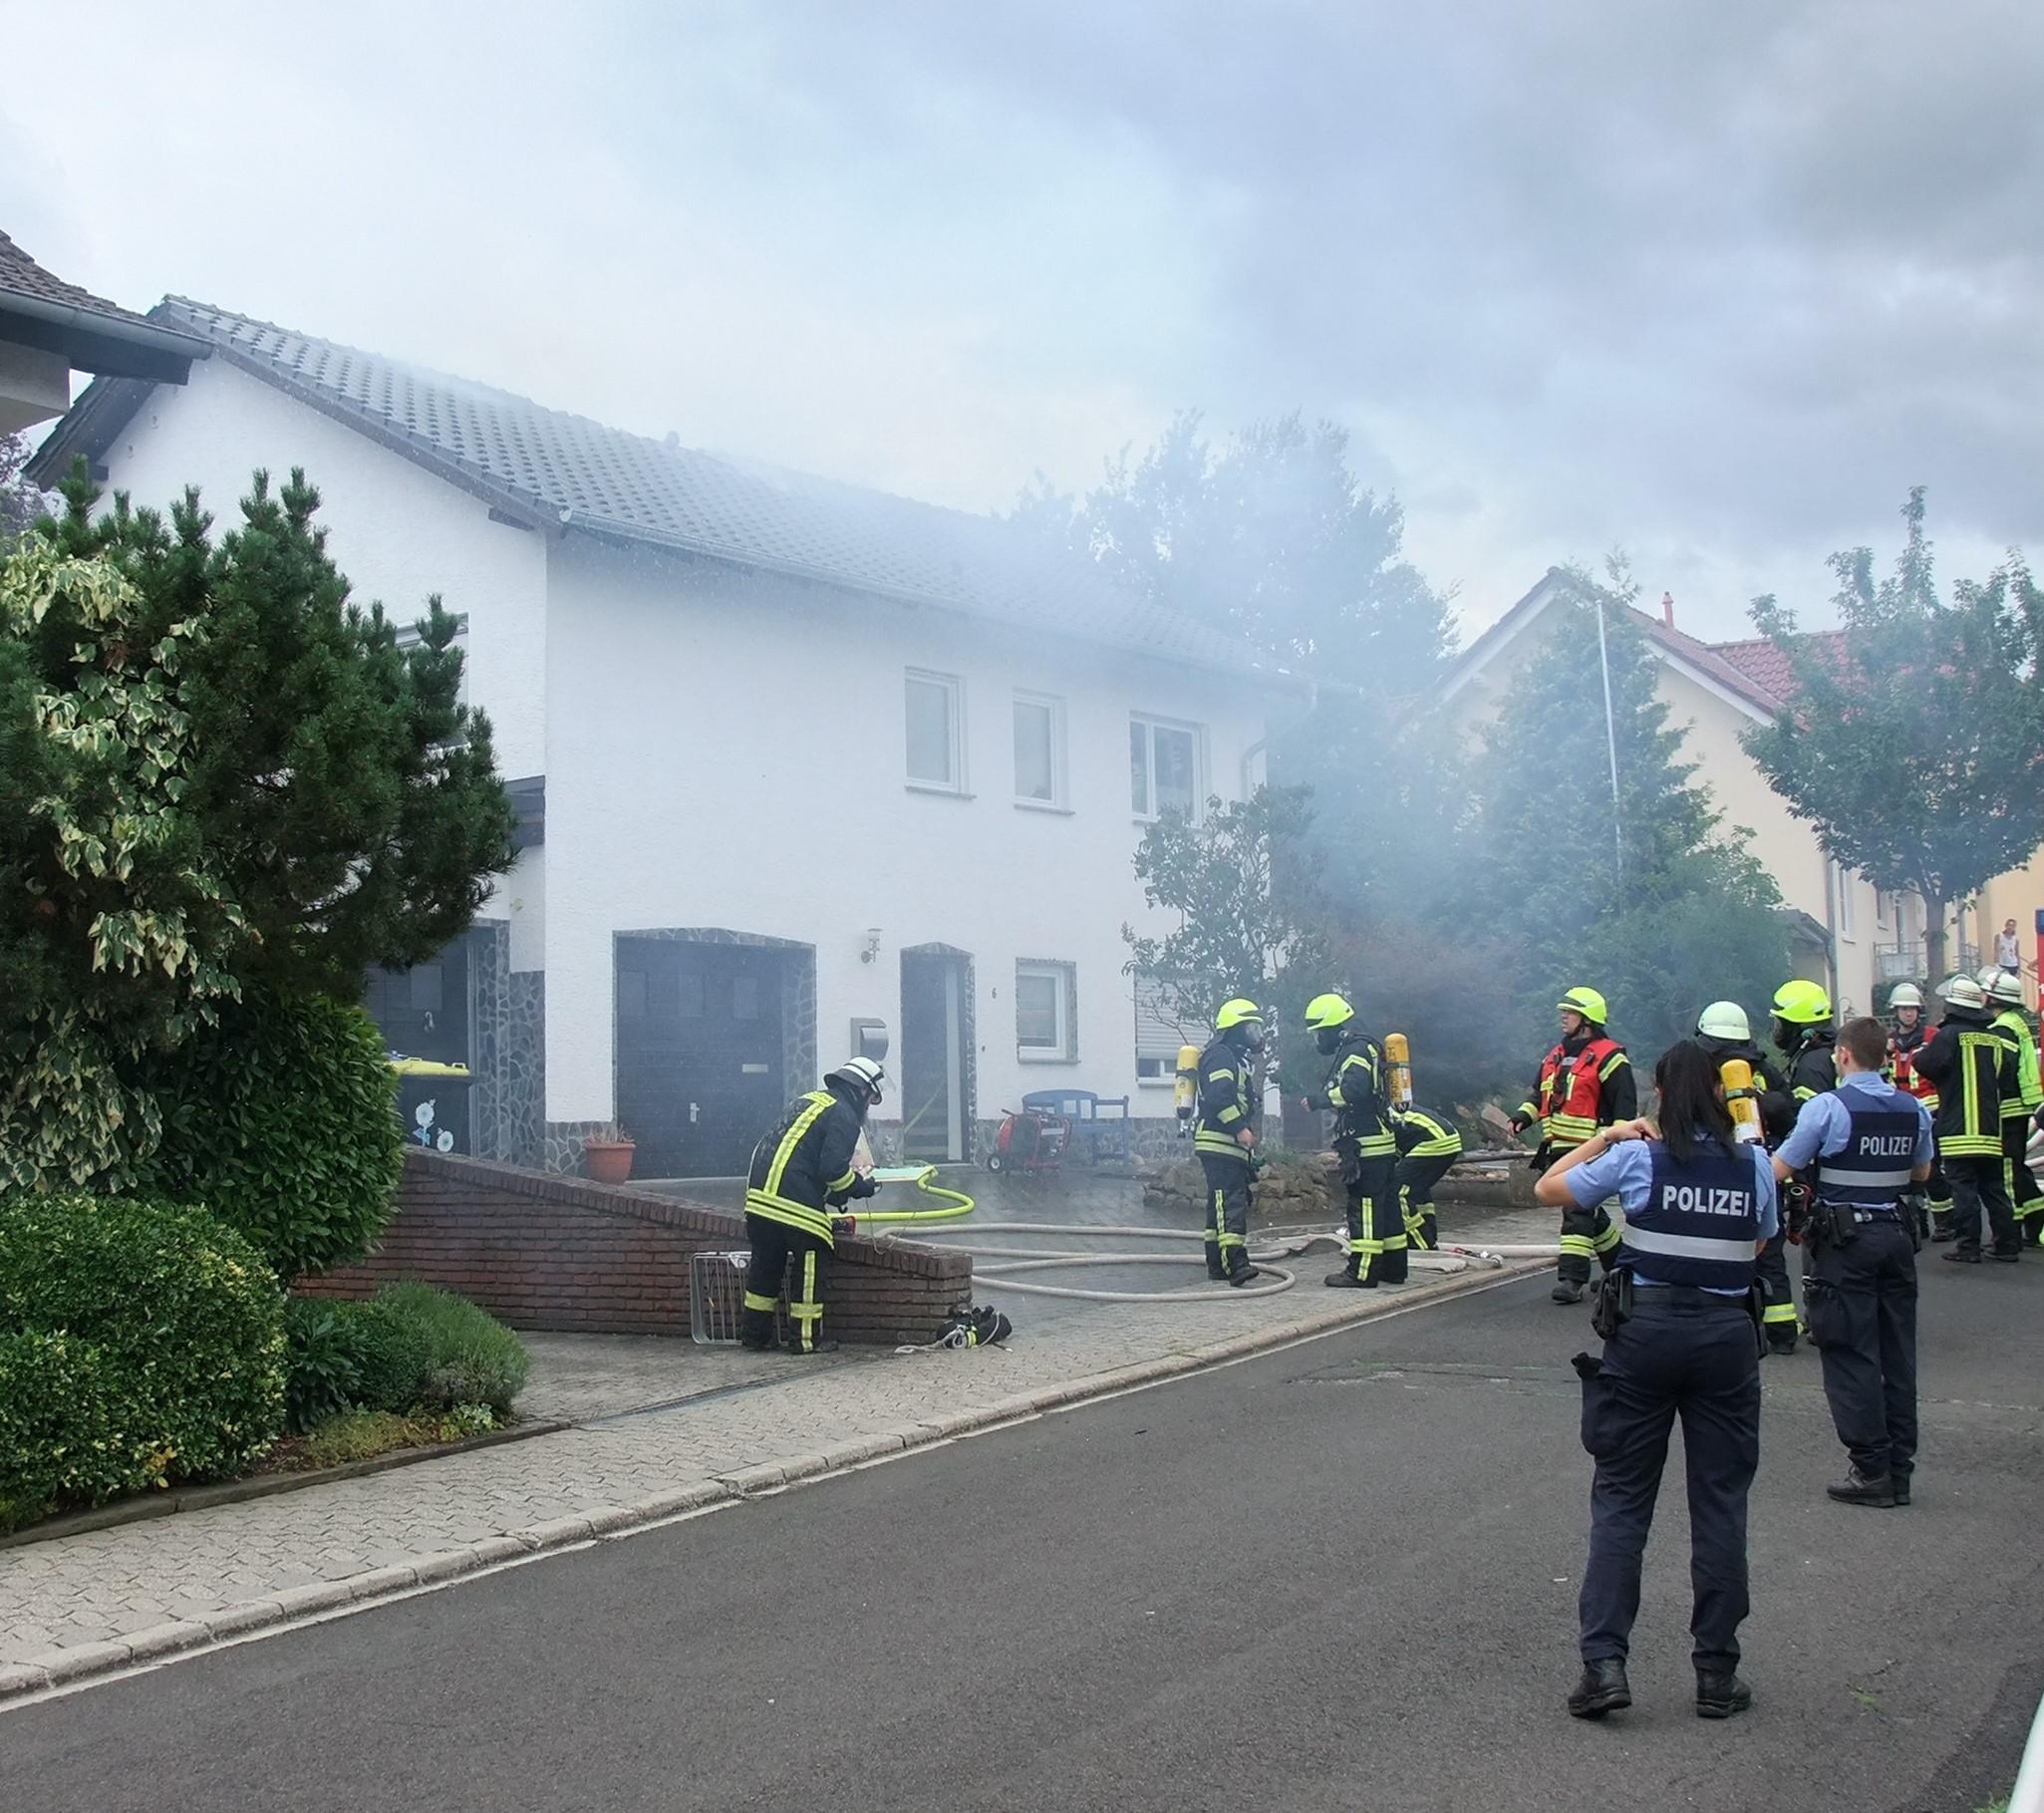 20190810_Dachstuhlbrand Hüffelsheim (4)